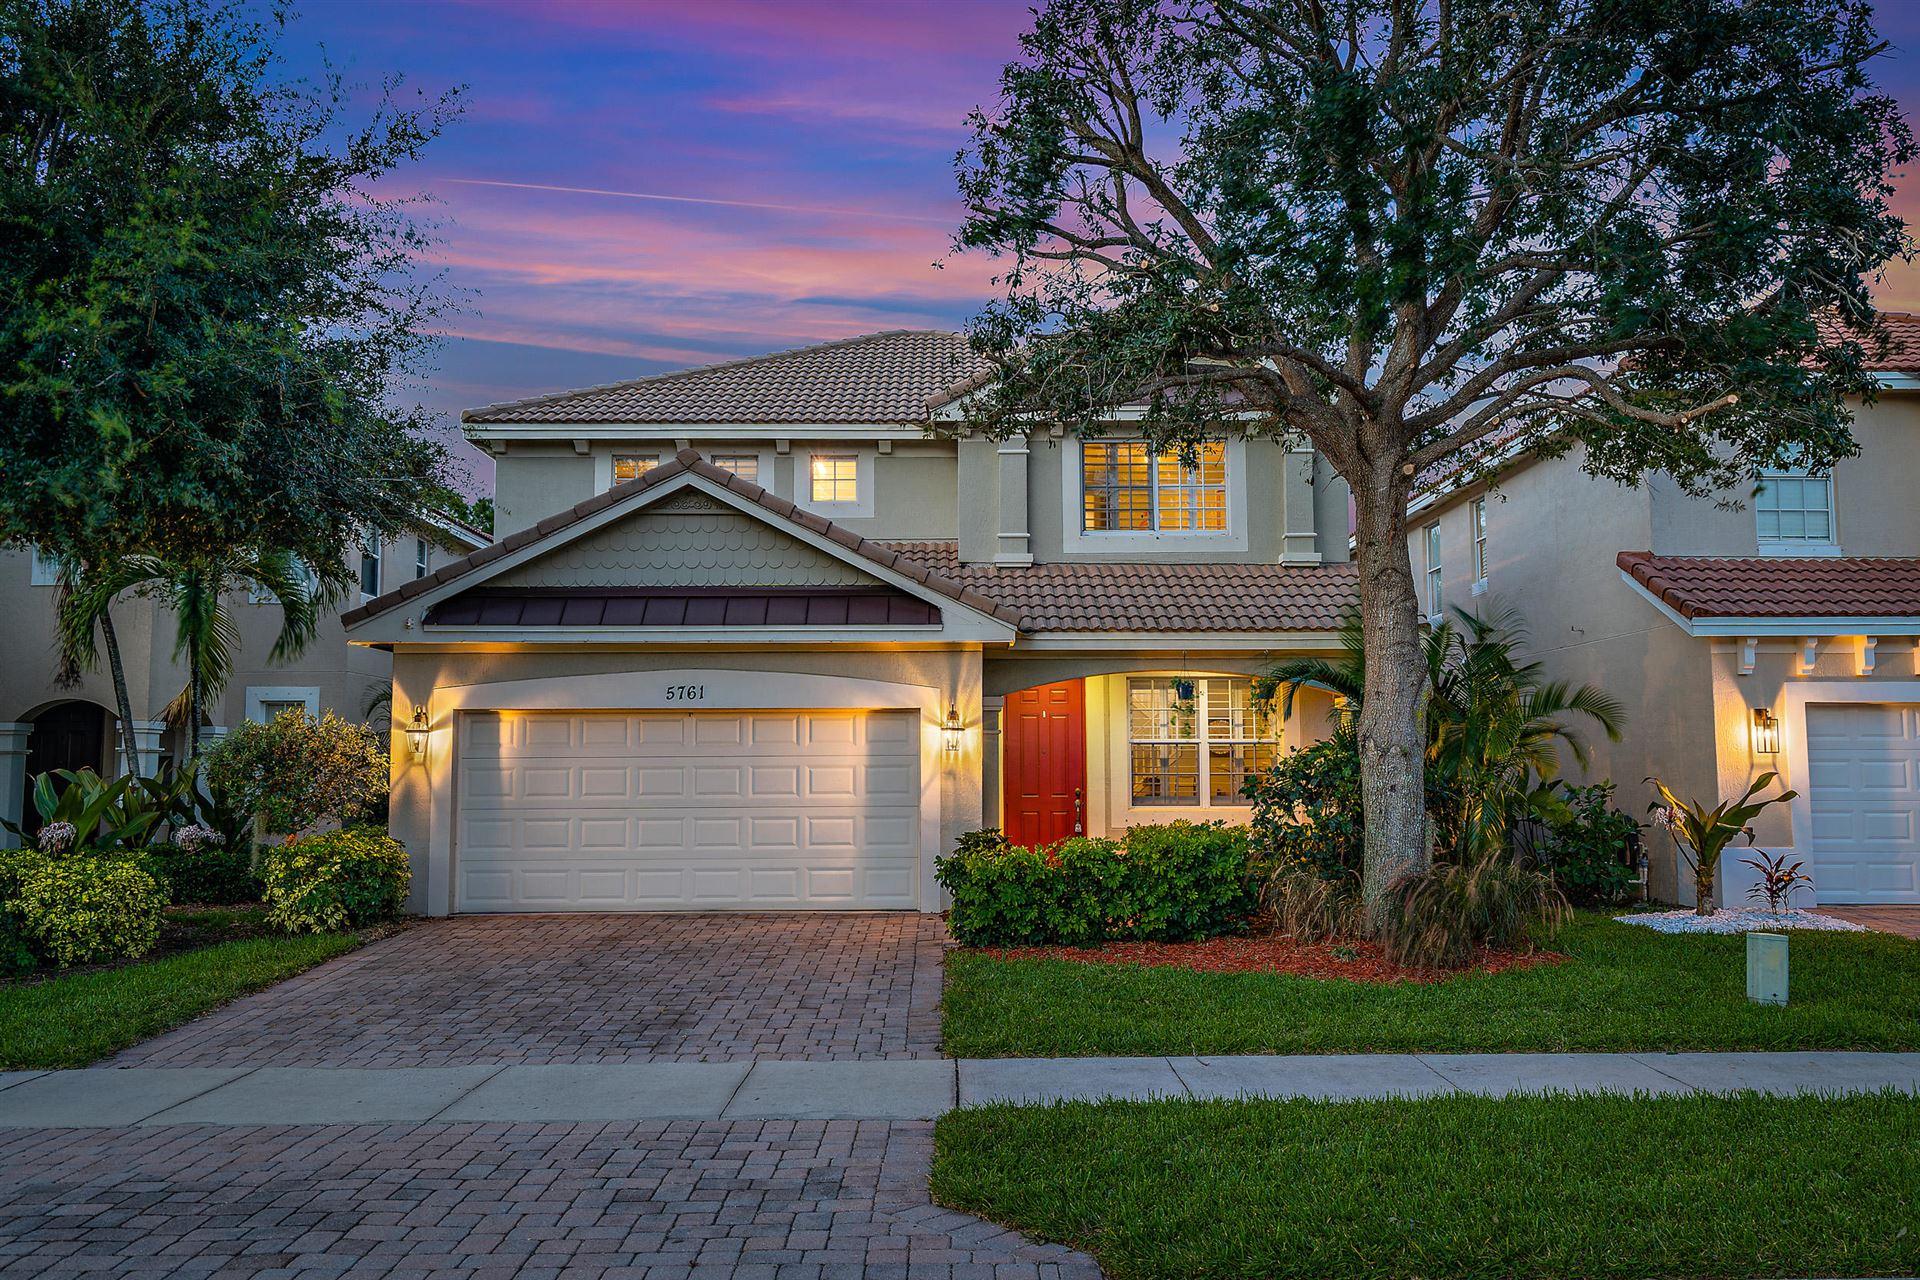 5761 SE Crooked Oak Avenue, Hobe Sound, FL 33455 - MLS#: RX-10731748